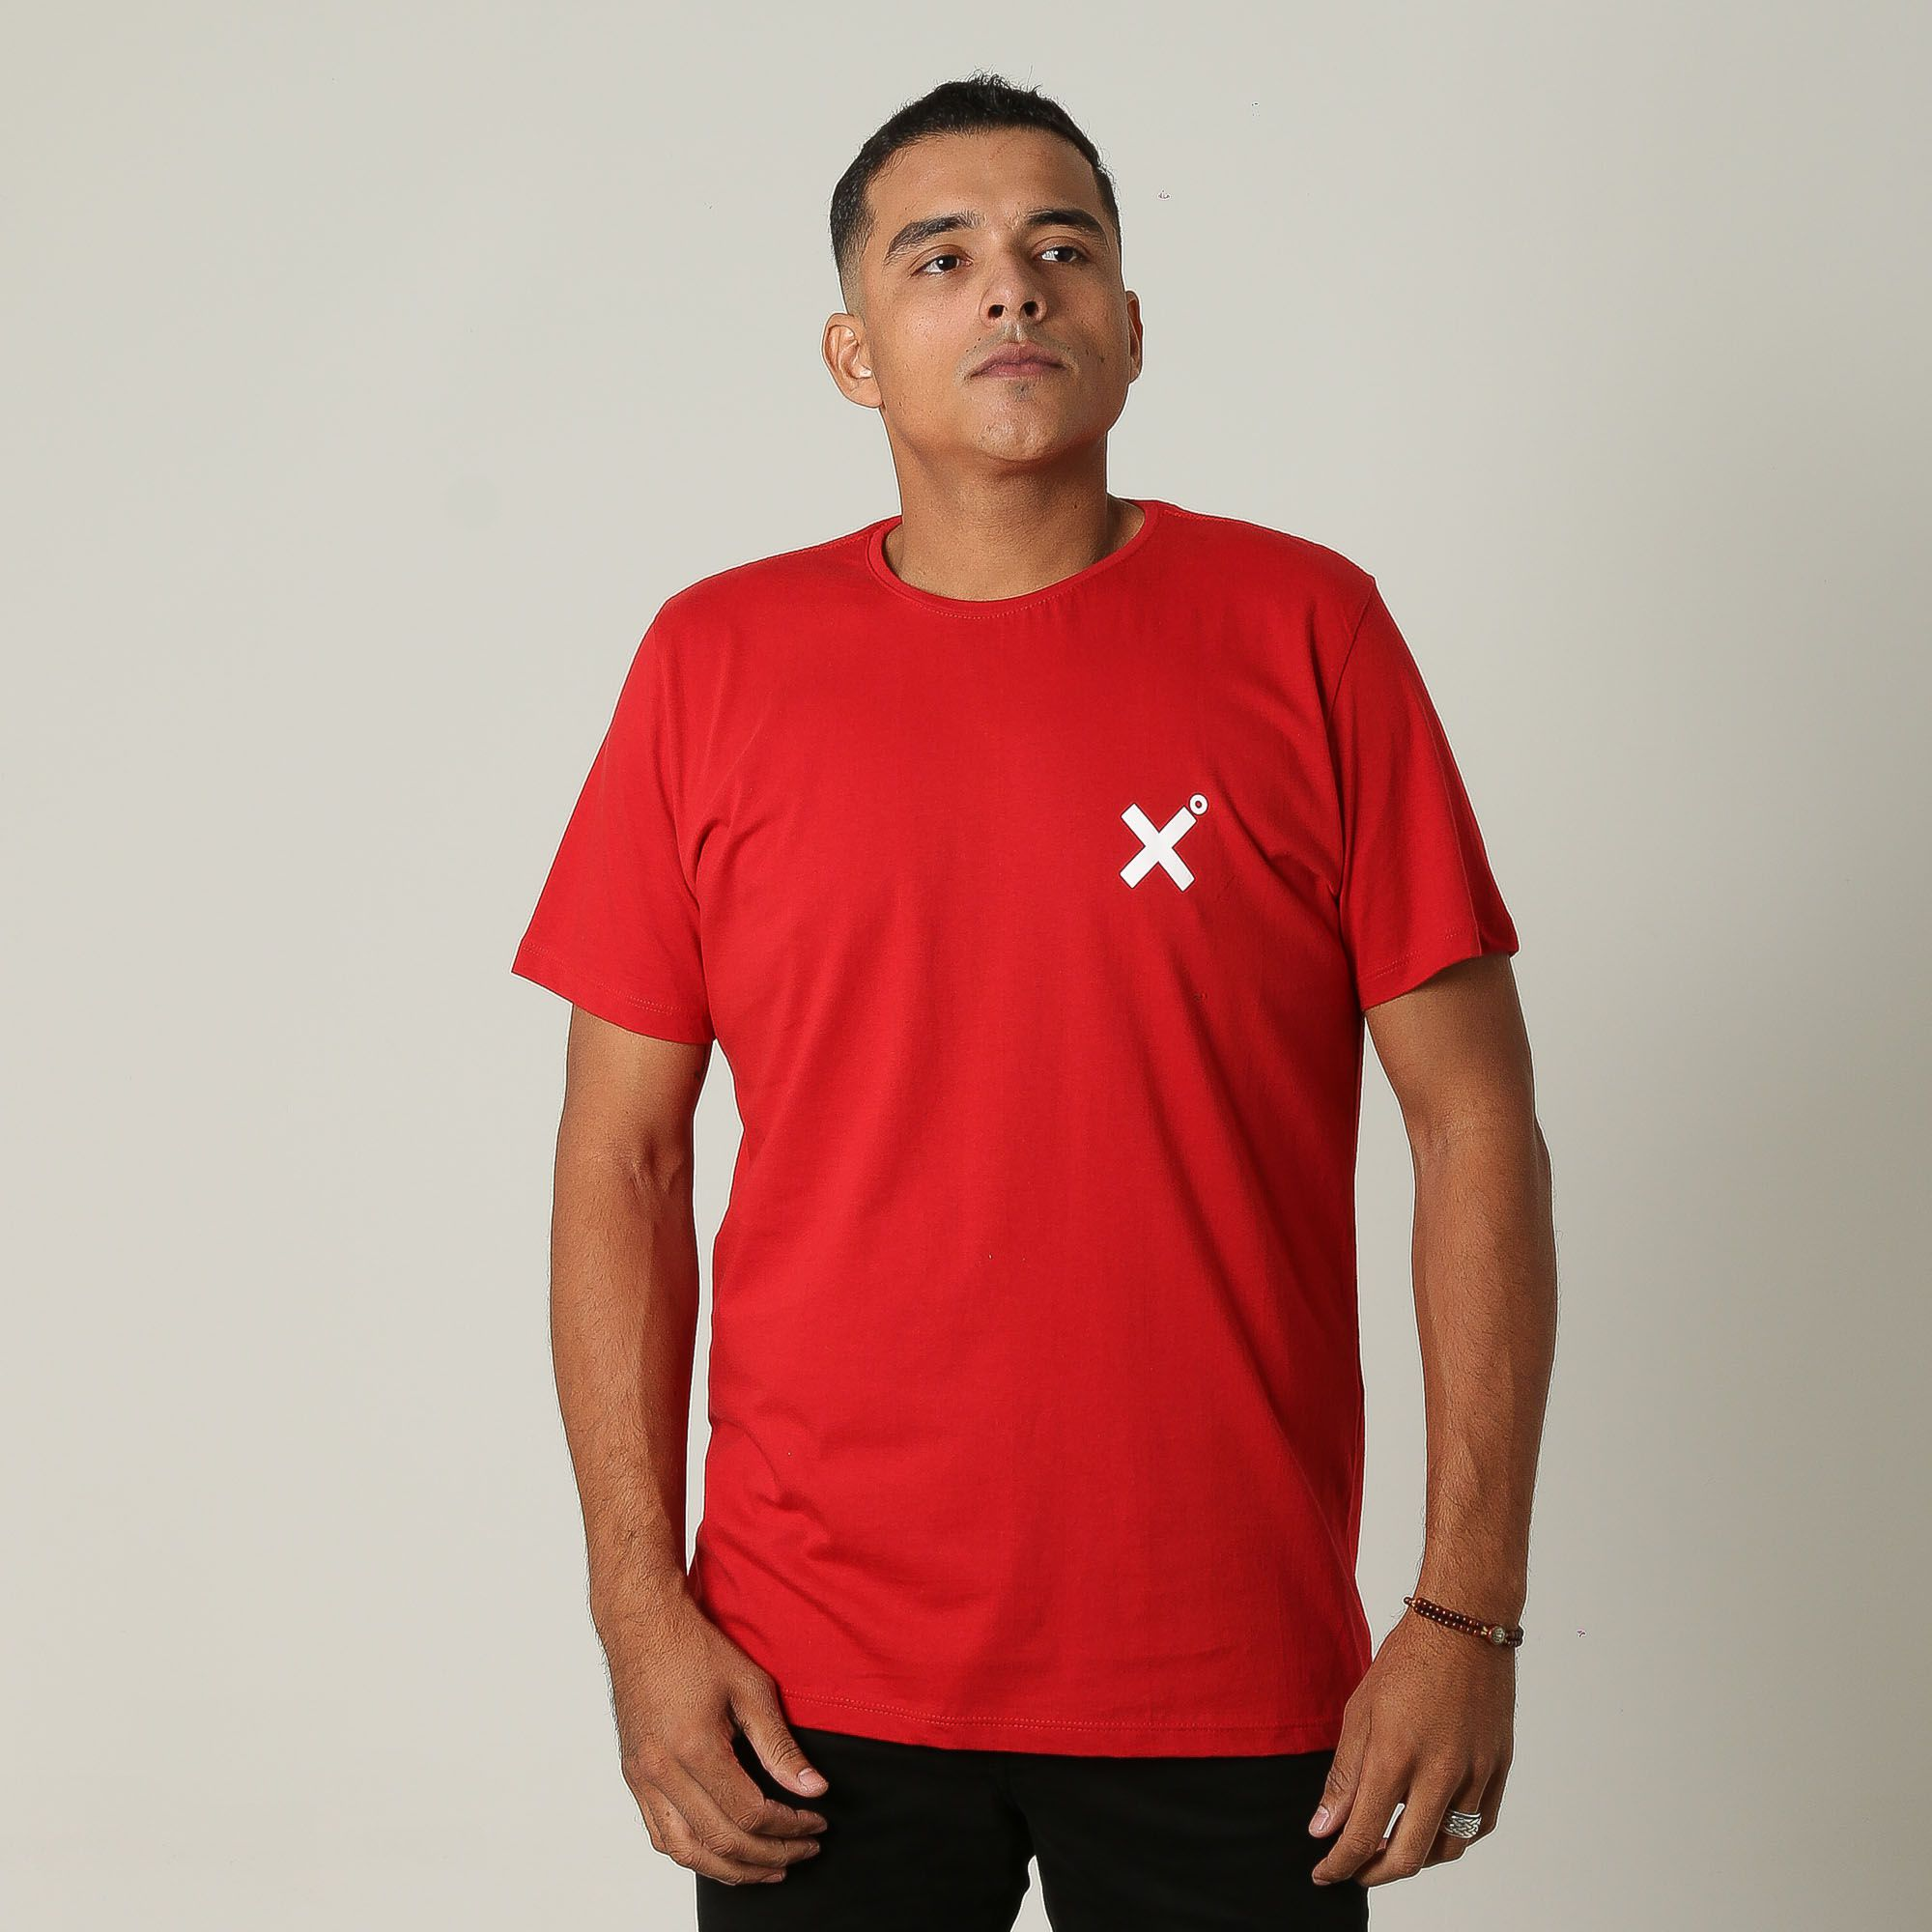 Camiseta Masculina TXC 1858